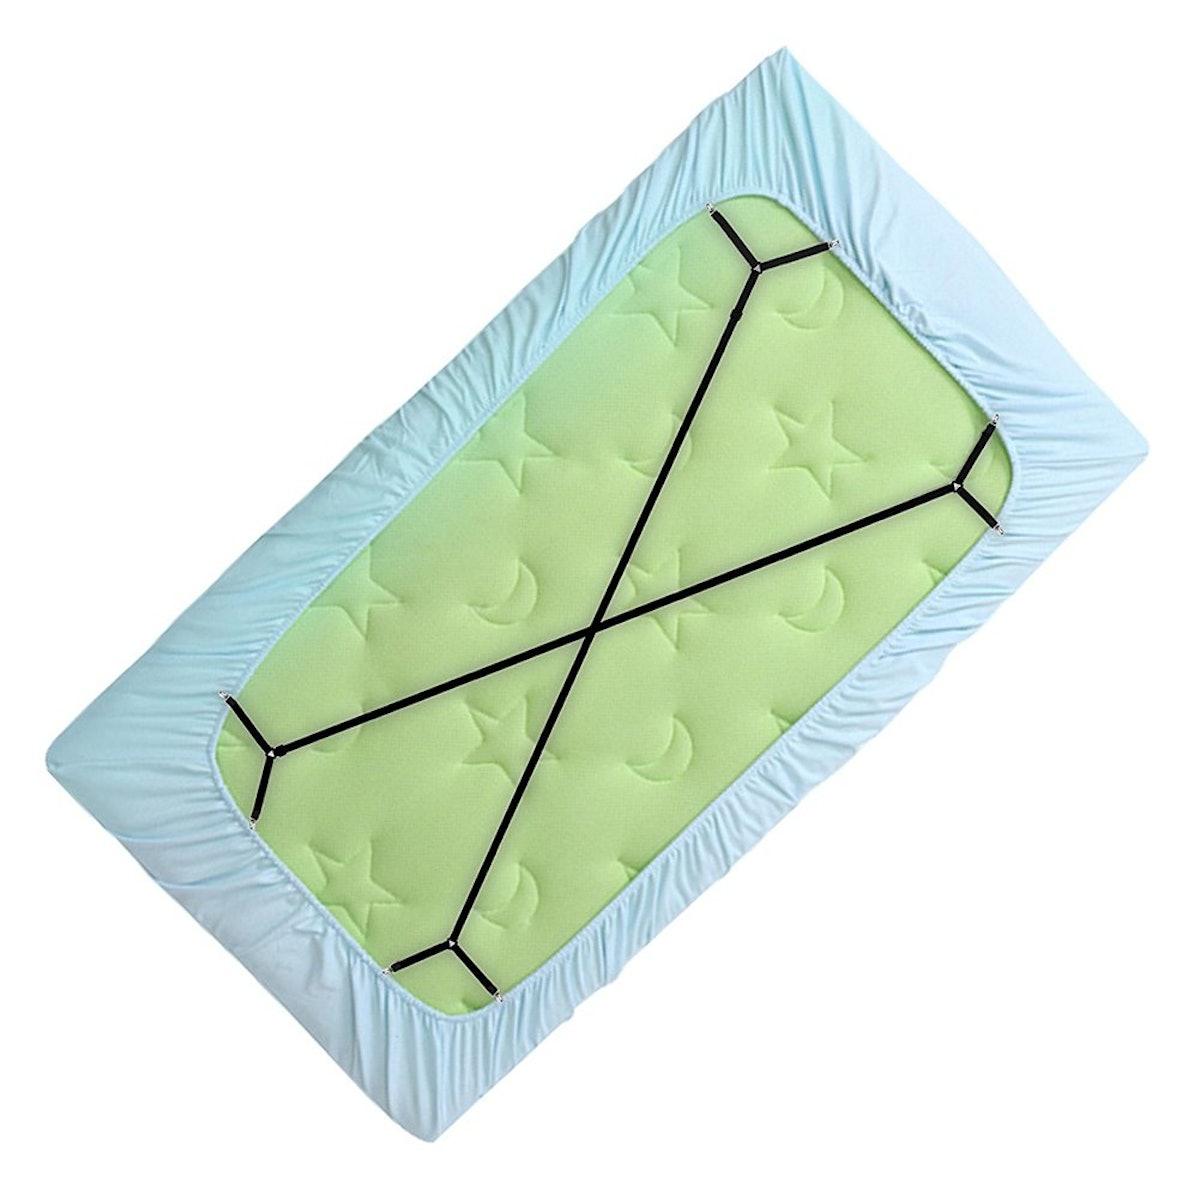 CoZroom Triangle Bed Sheet Fastener Straps (4 Straps)